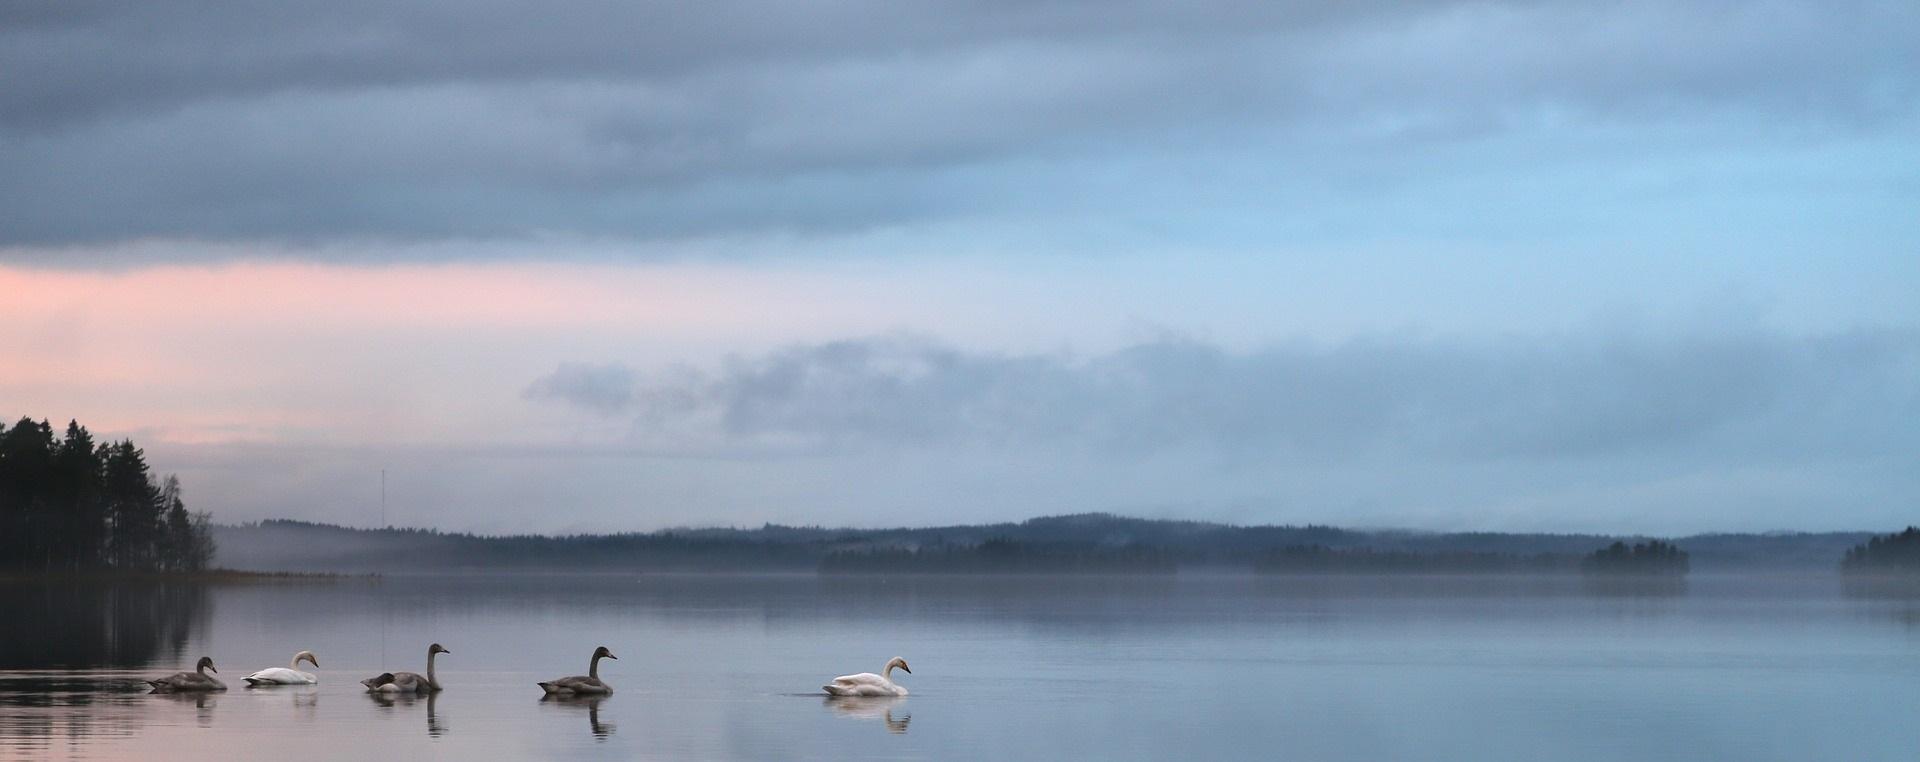 Blå bakgrundsbild, svanar i sjö.